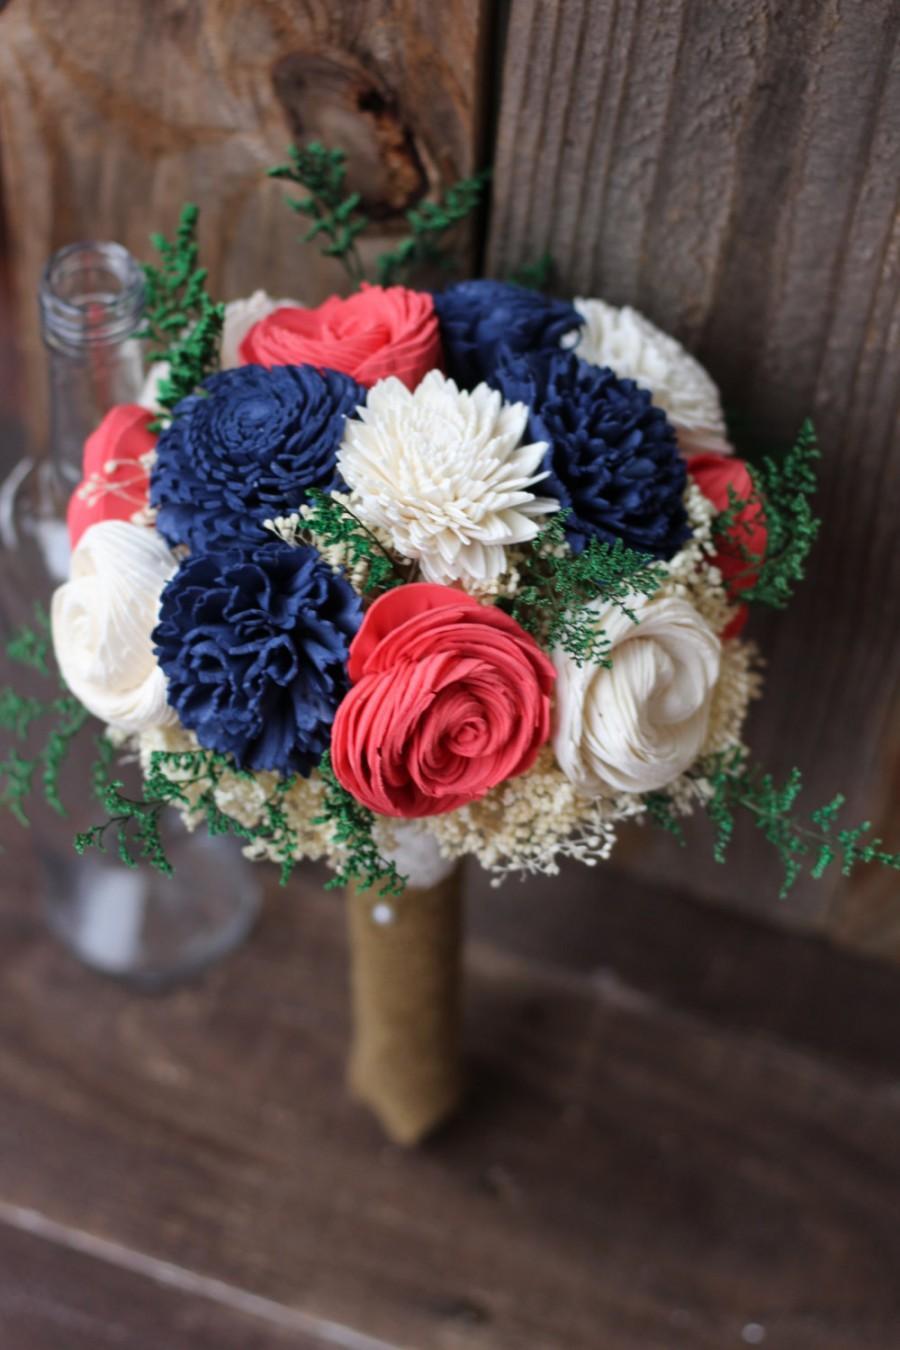 Mariage - Sola bouquet, keepsake bouquet, wedding flowers, rustic wedding, deep navy deep coral bouquet